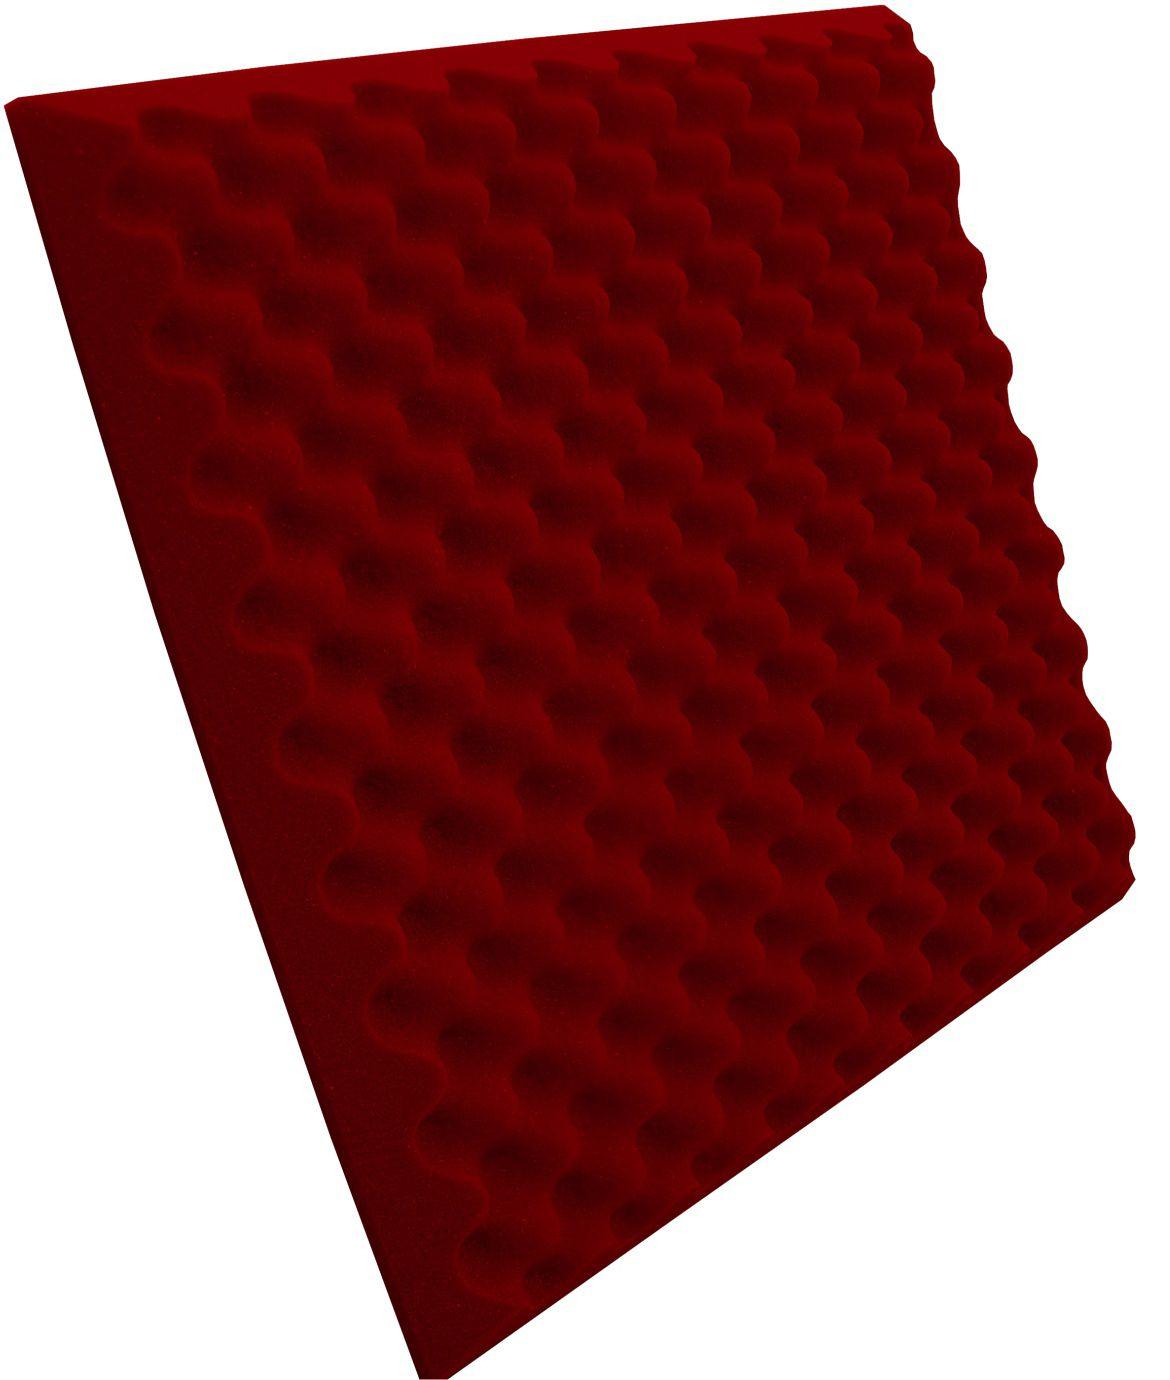 Espuma Perfilada - Kit 8 - Vermelho - 50mm (2m²)  - Loja SPL Acústica